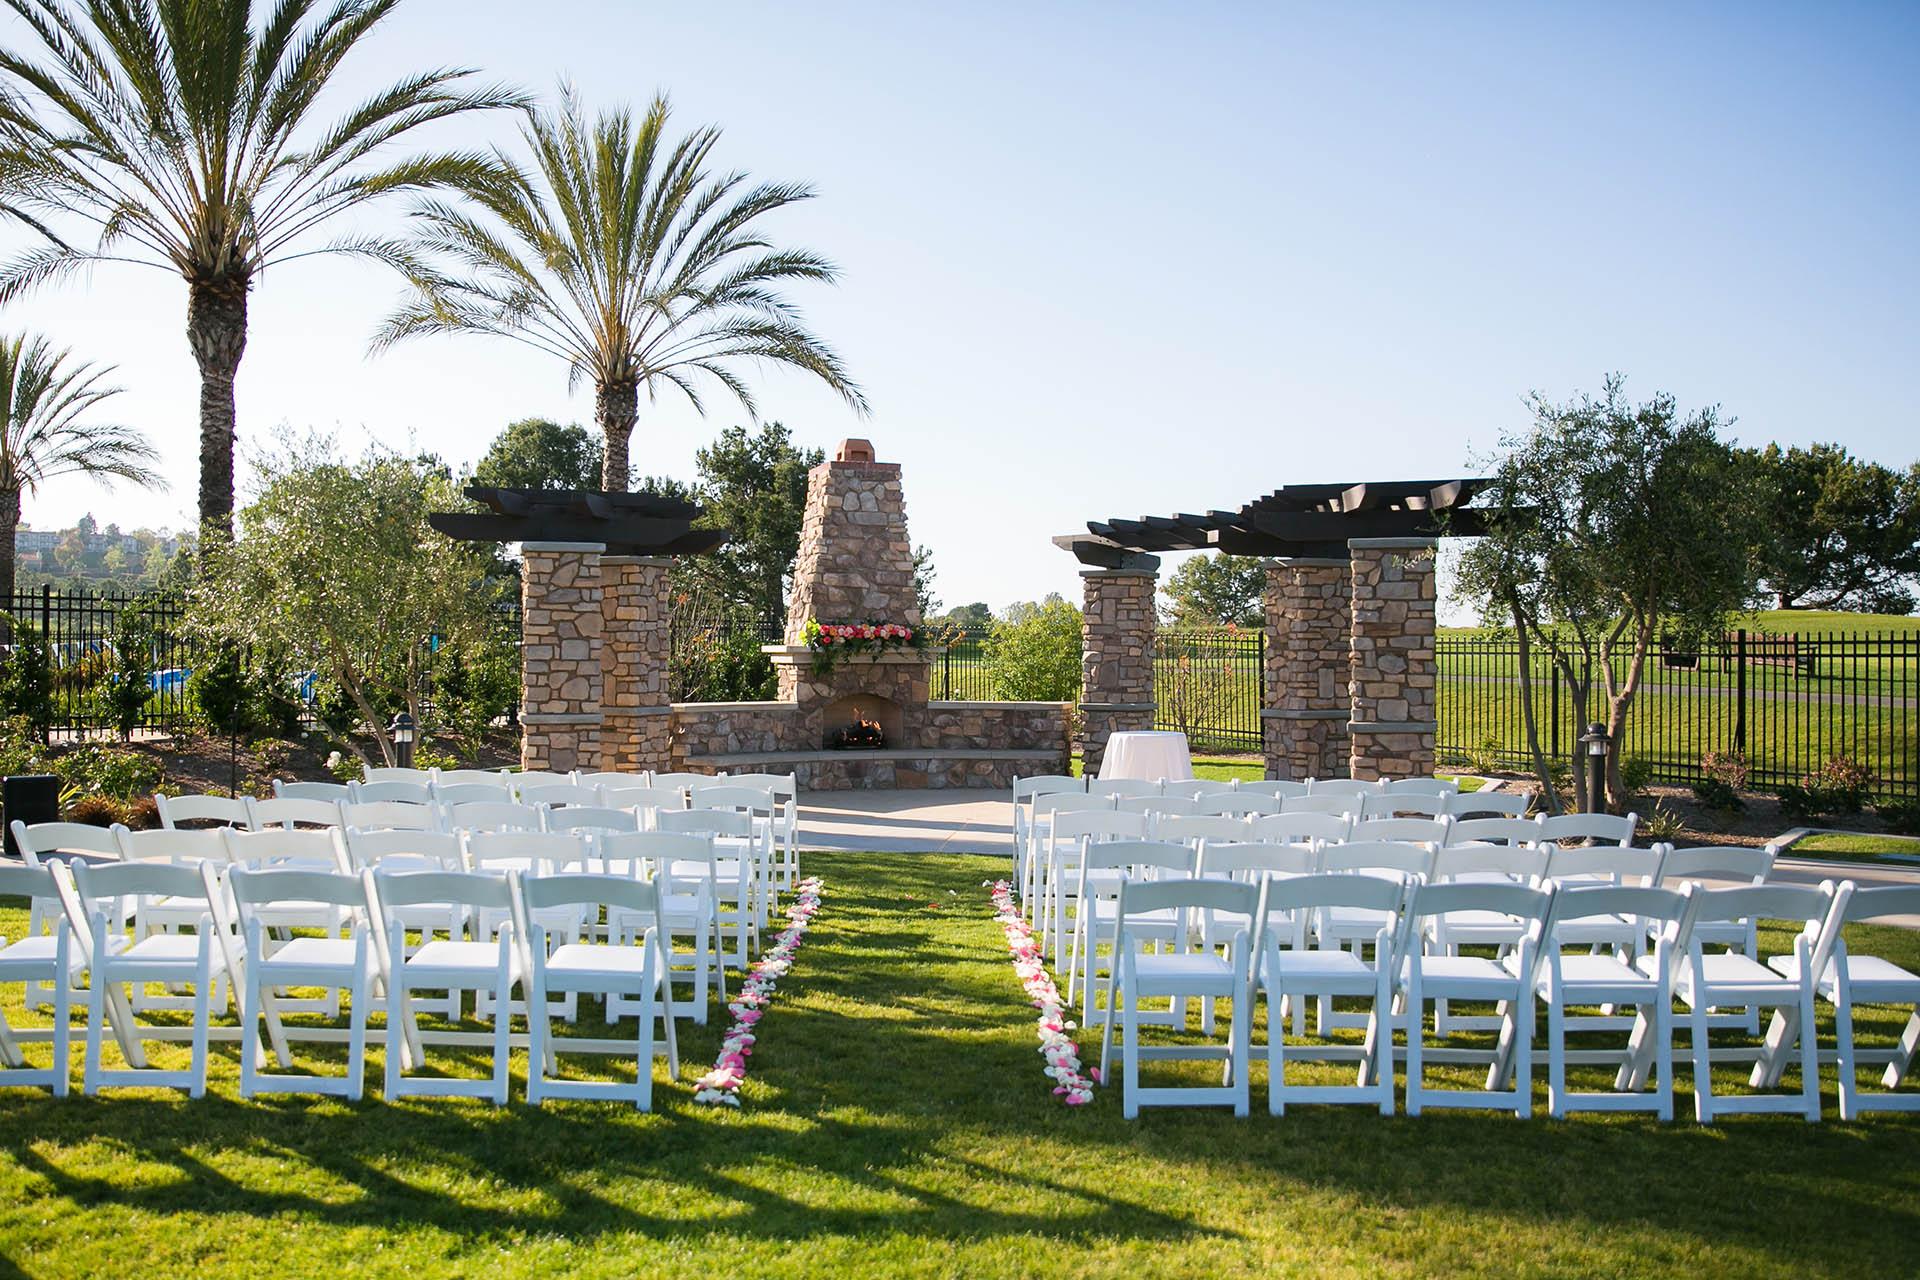 Aliso viejo wedgewood weddings stunning wedding ceremony lawn junglespirit Images